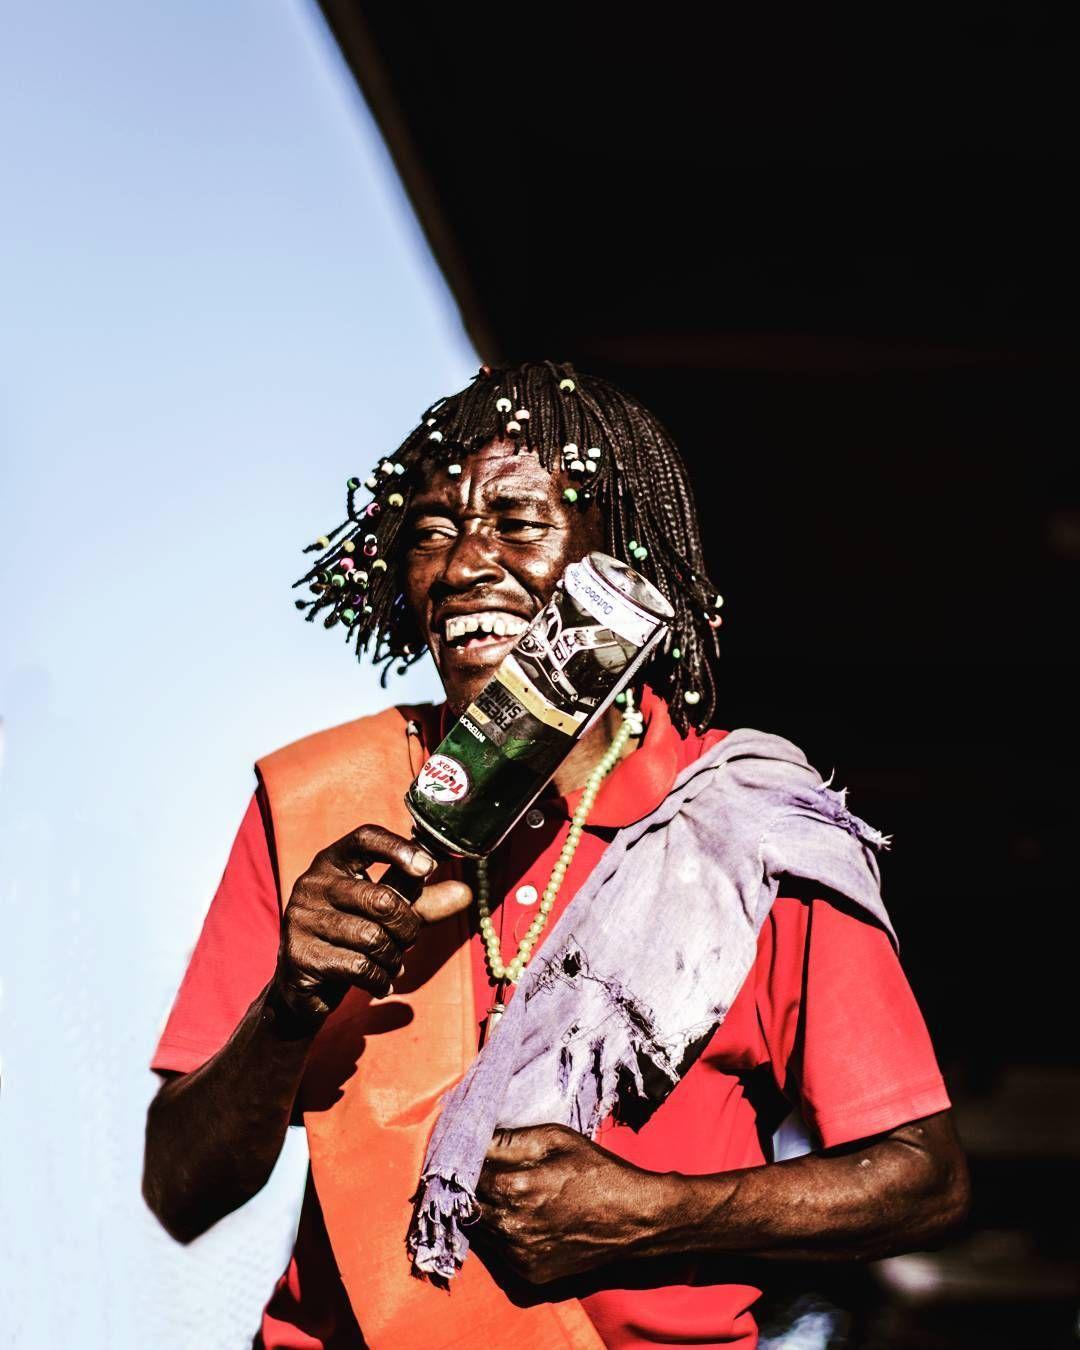 A Giriama Dancer On His Entertainment Hustle On The